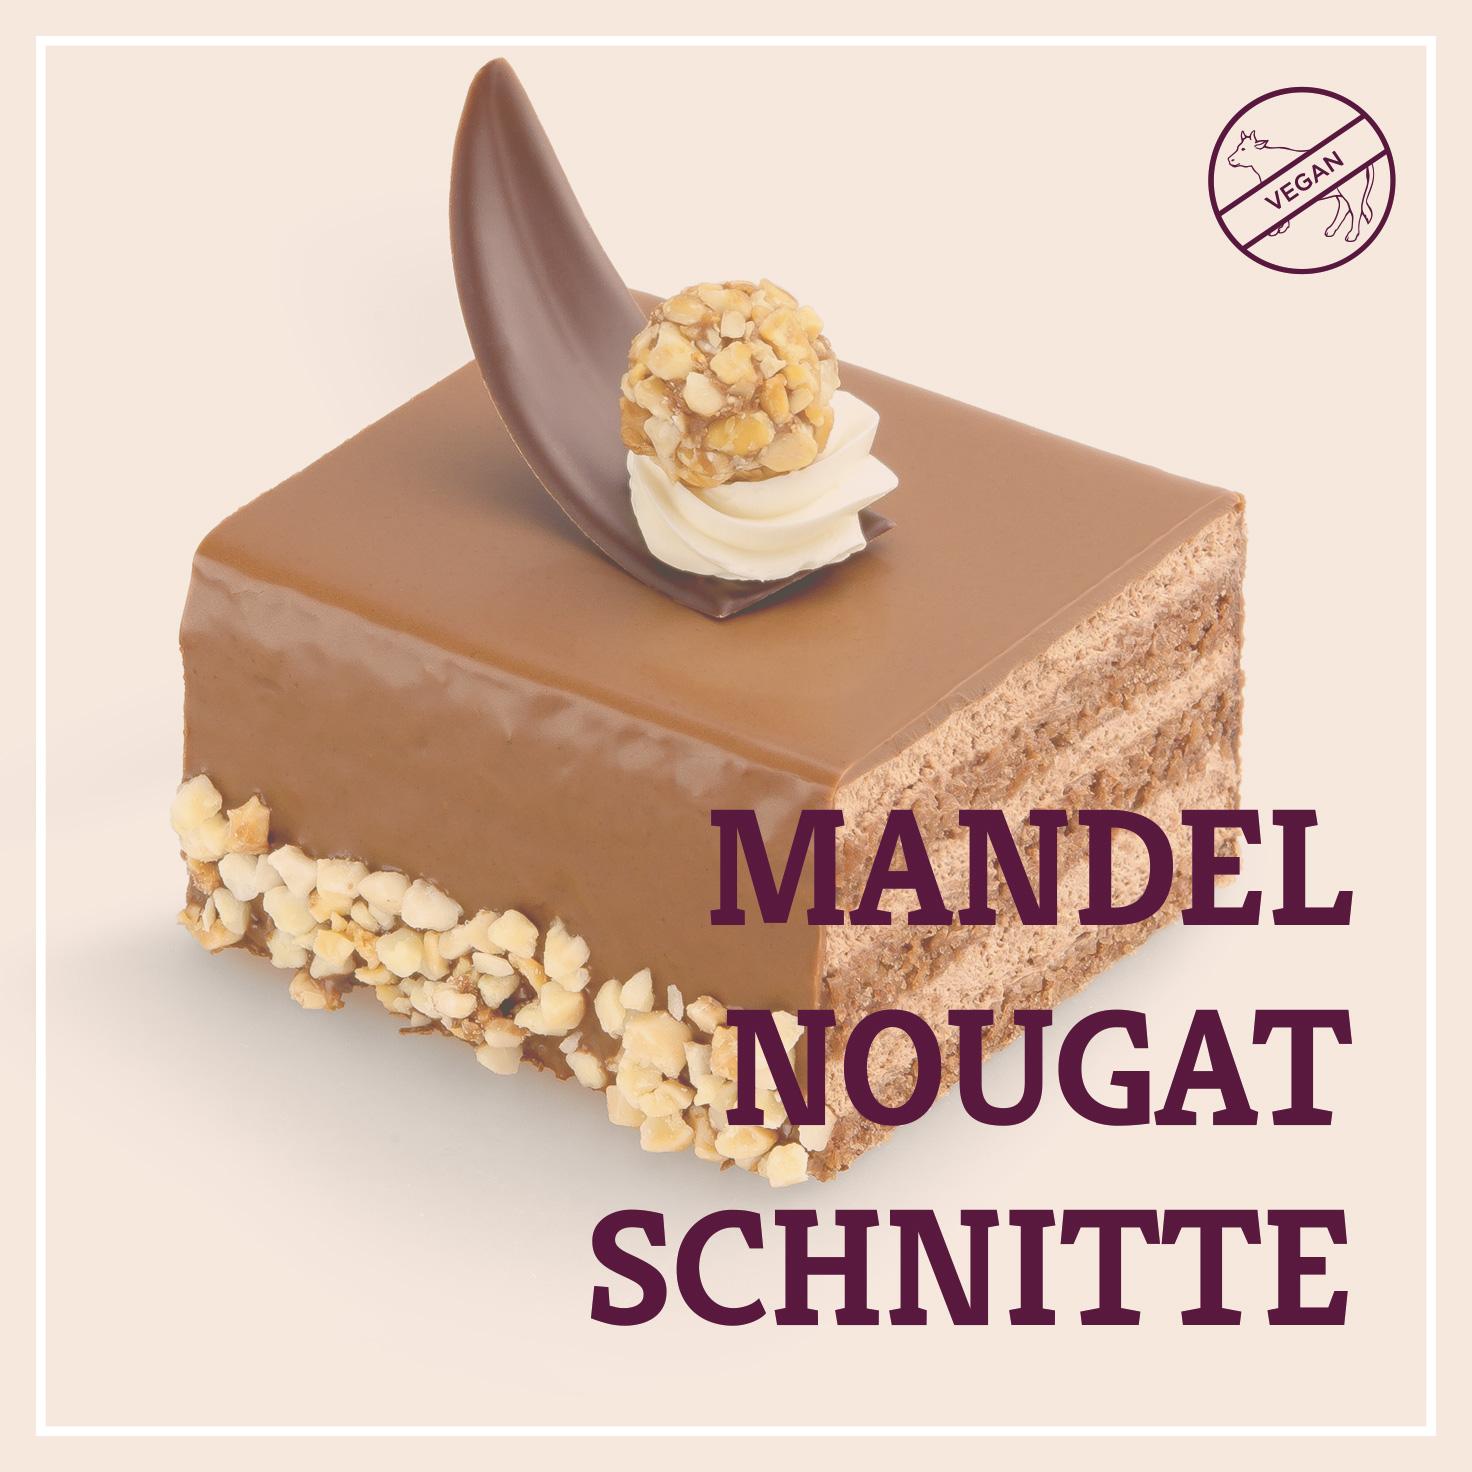 Heiss & Süß - Mandel-Nougat Schnitte